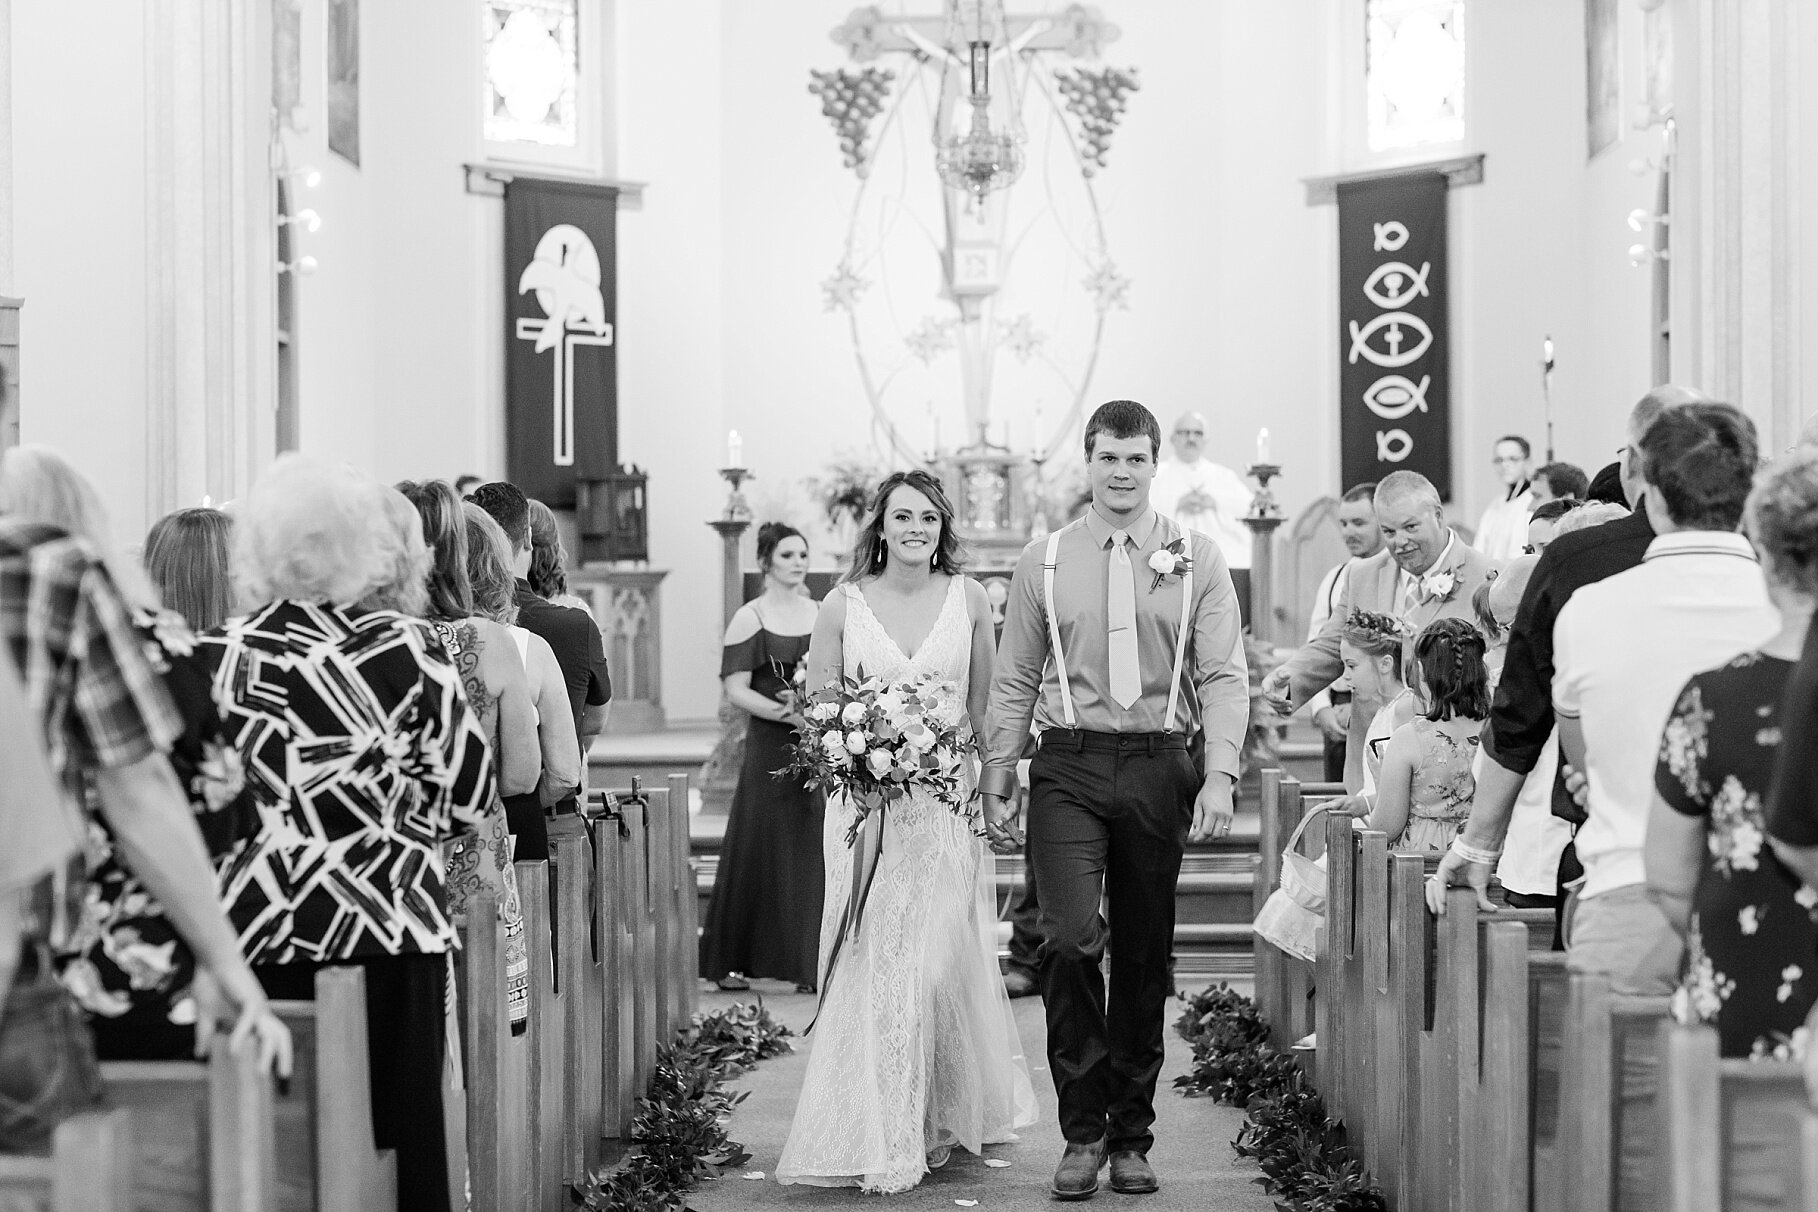 Earth-Toned Wedding by KKP Associate Wedding Photographer and Kelsi Kliethermes Photography Best Columbia Missouri Wedding Photographer_0002.jpg